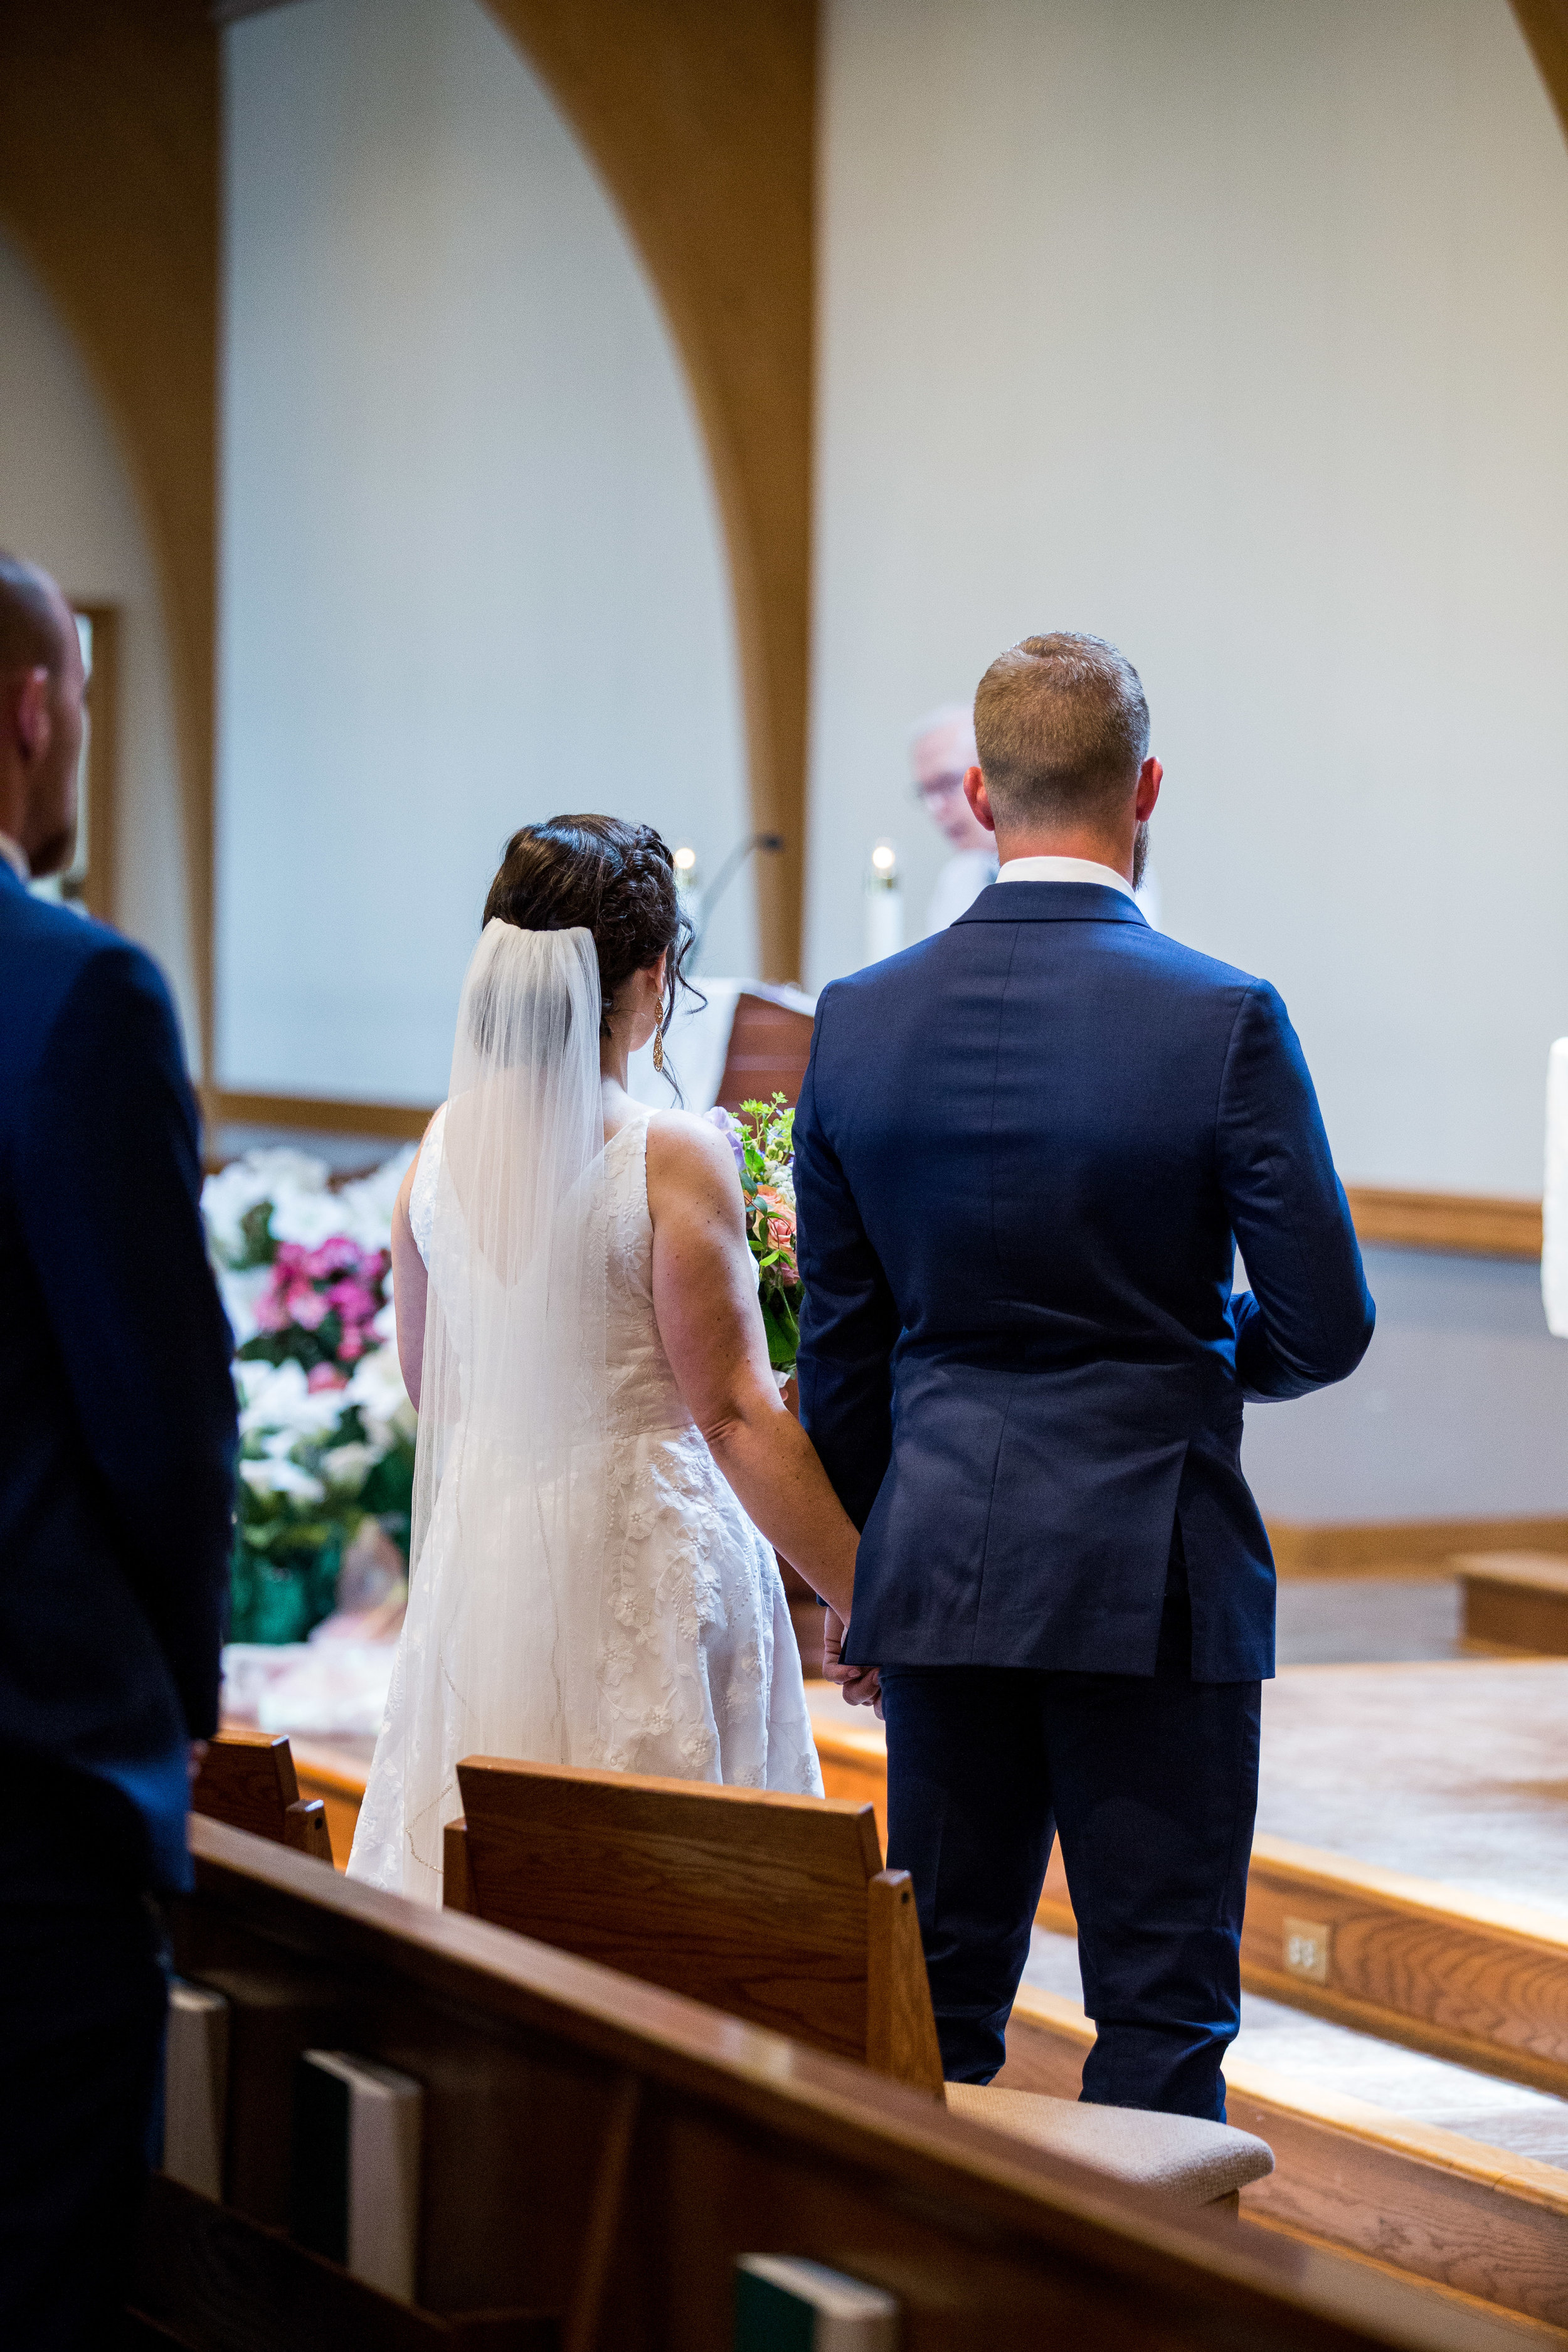 Natalie and Dallas Mooney Wedding 6-8-19_Tania Watt Photography-99.jpg